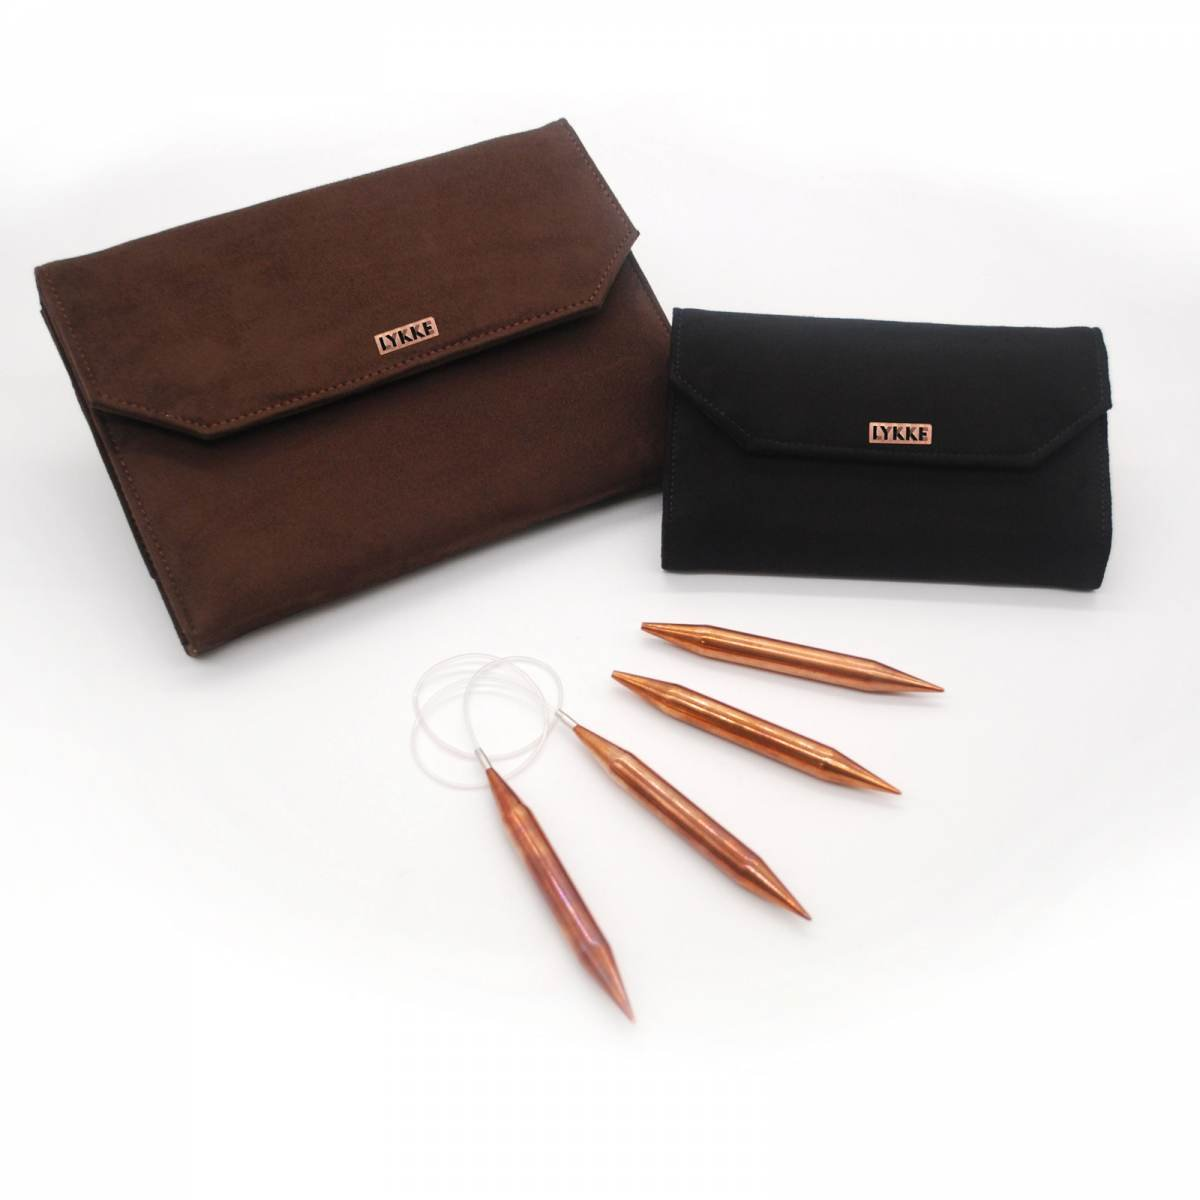 Lykke Cypra 5 Interchangable Copper Knitting Needle Set